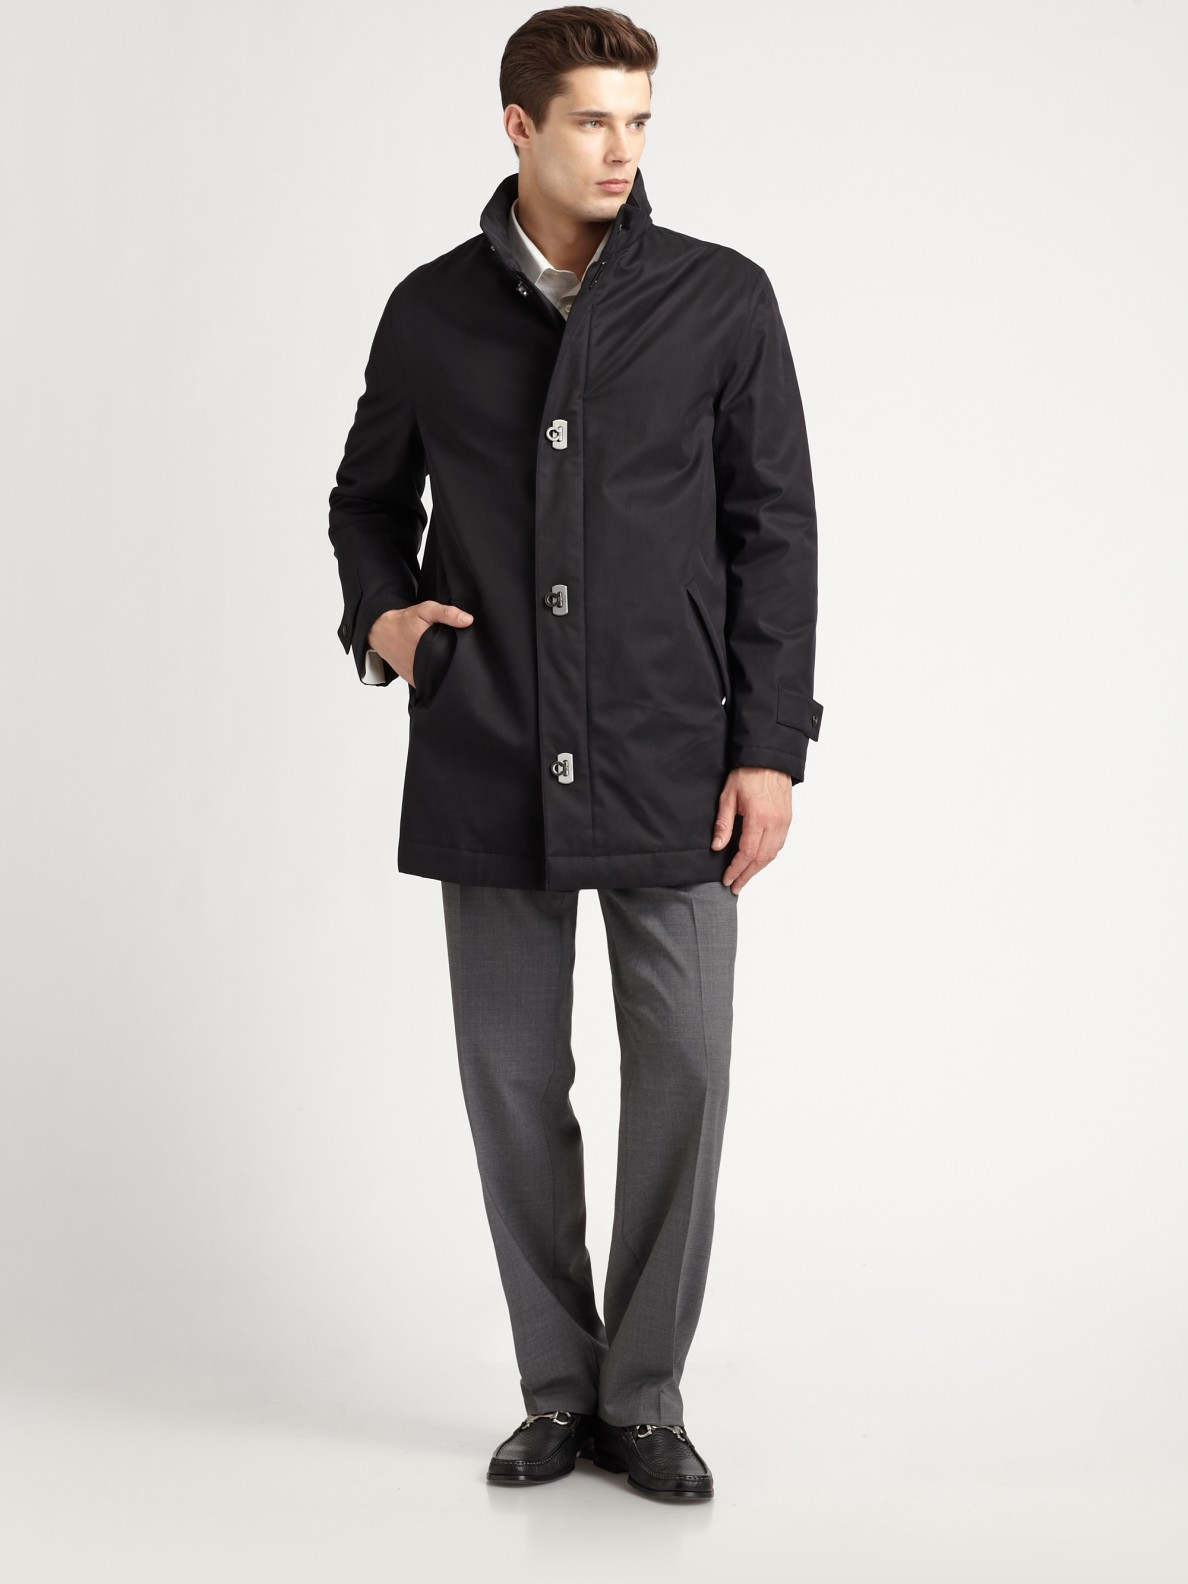 Ferragamo Cotton Car Coat in Black for Men | Lyst